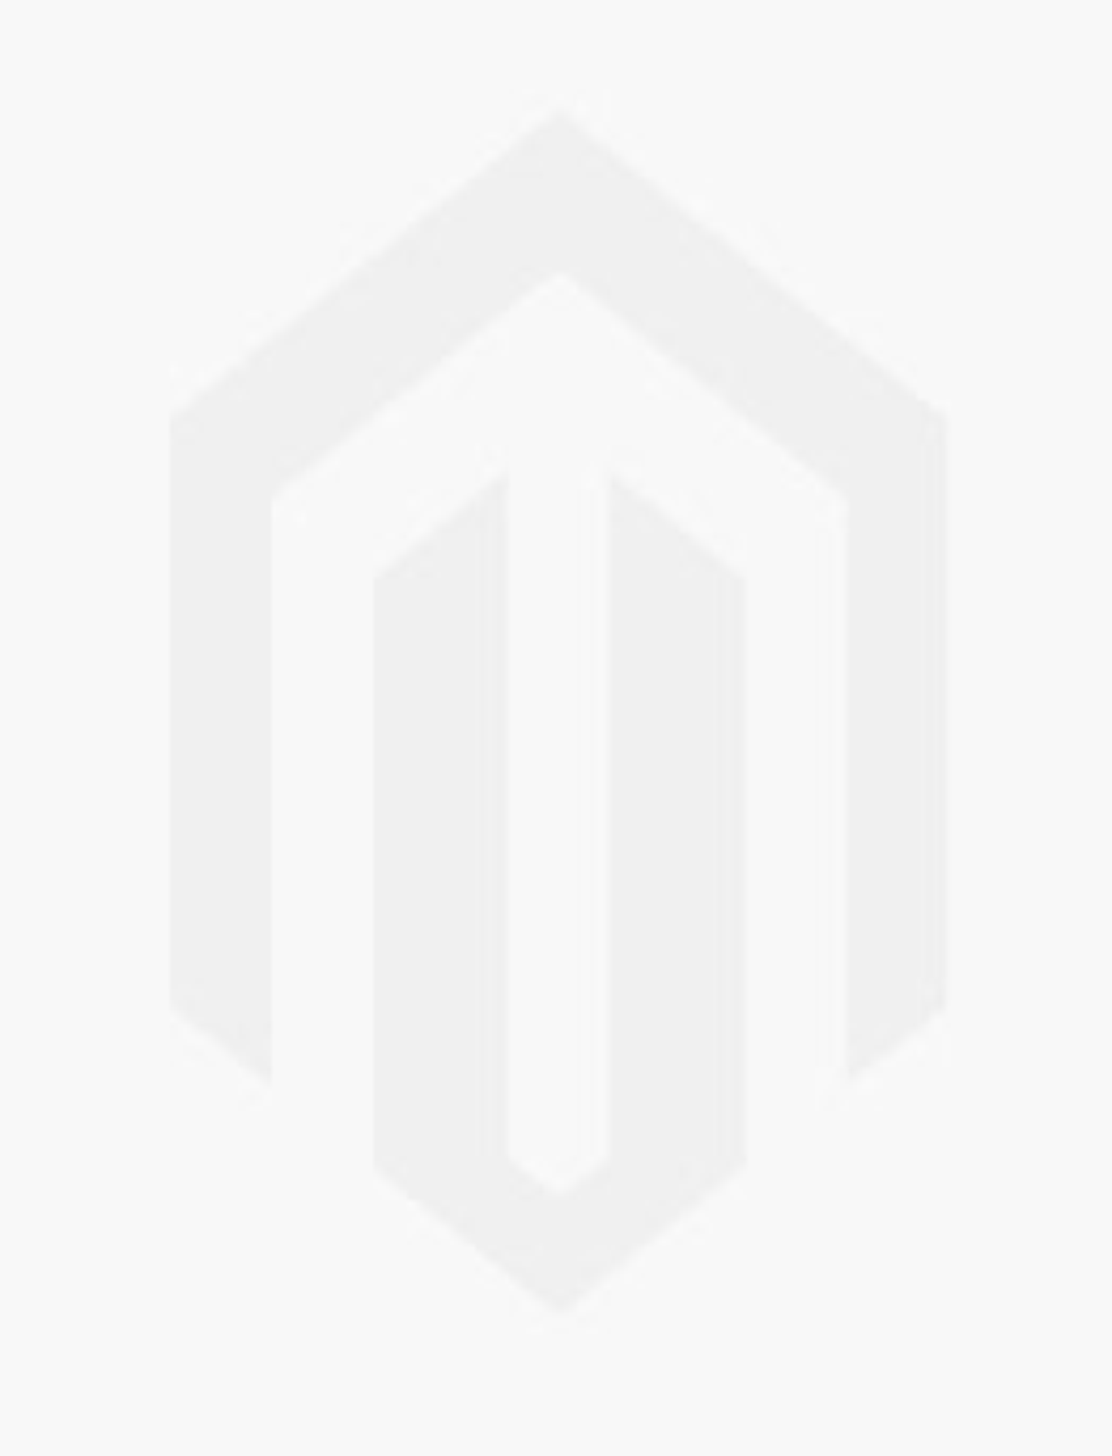 14k 18mm Polished Round Bar Traditonal Stud Image #1